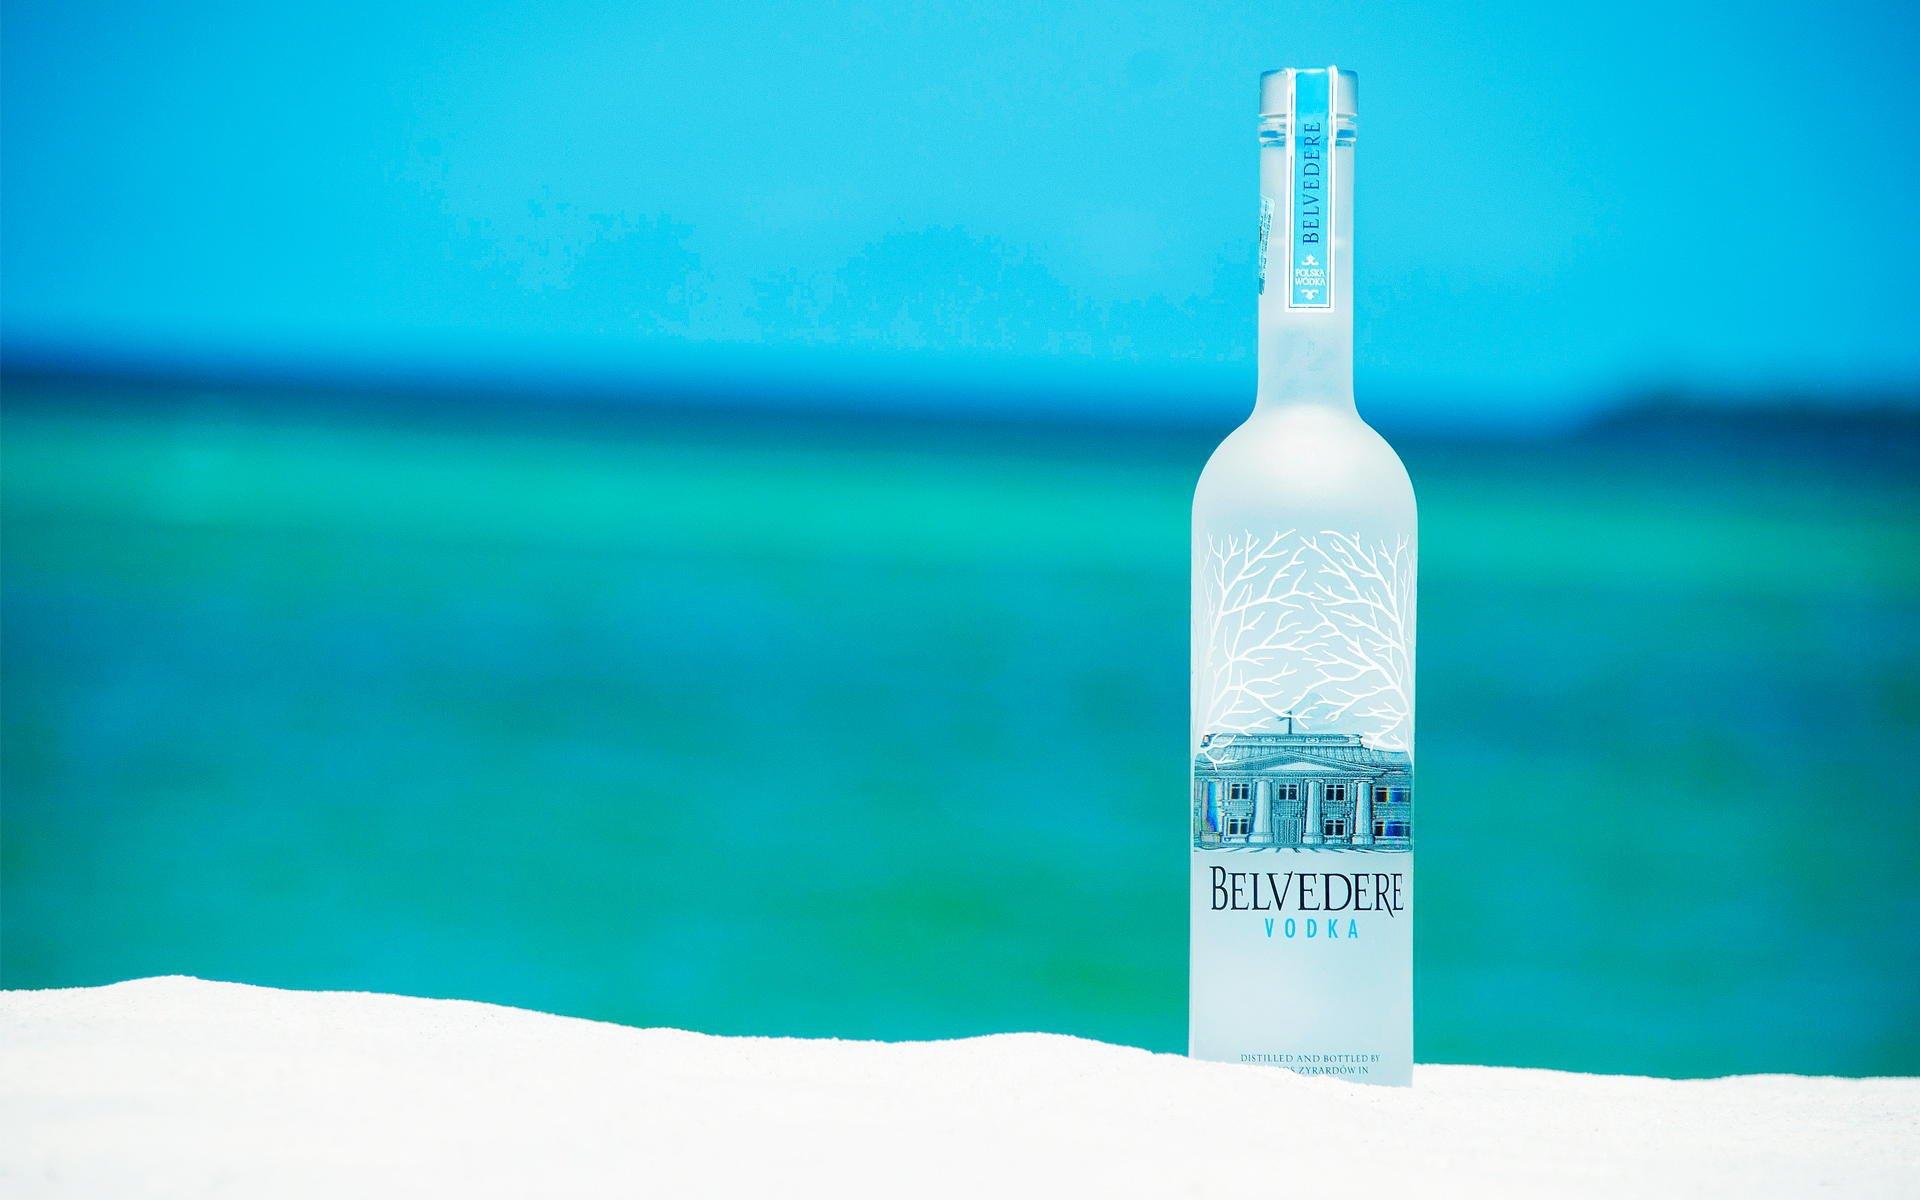 belvedere vodka wallpaper 71401